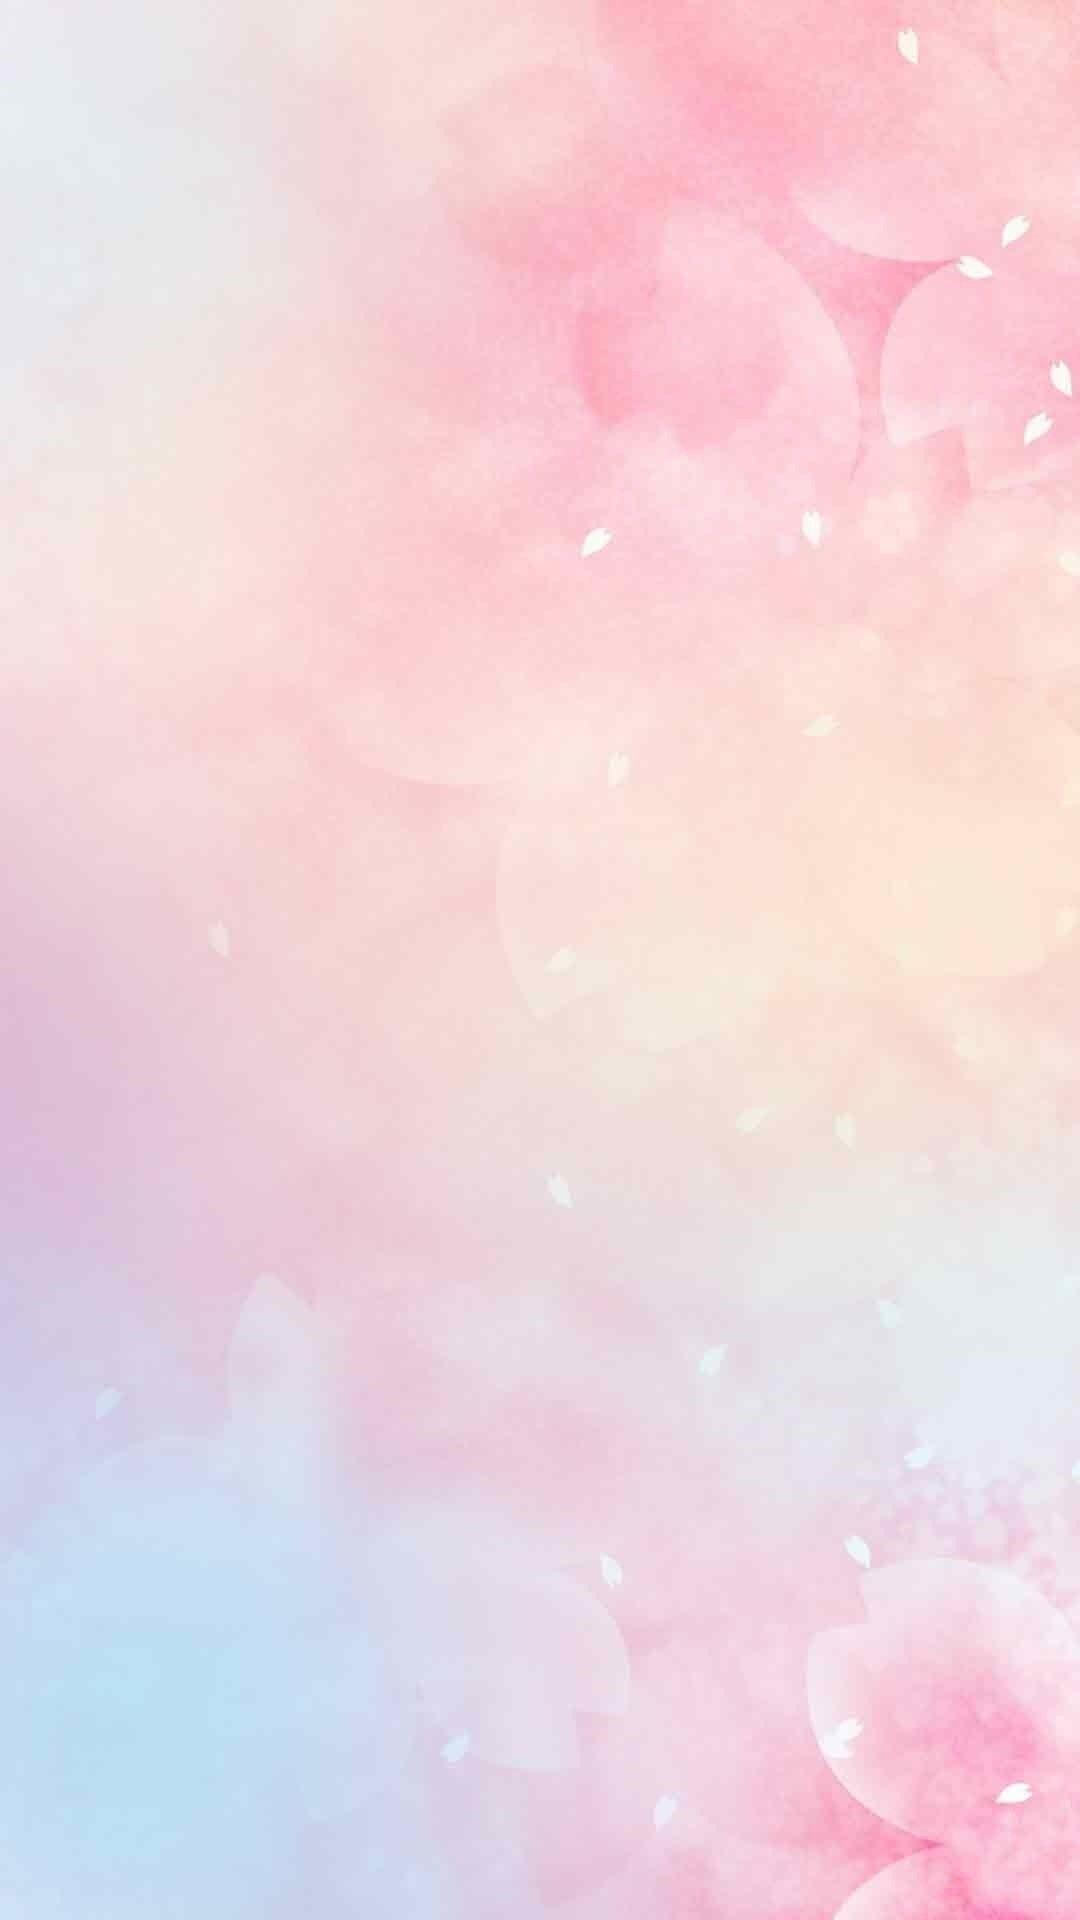 Pastel phone wallpaper